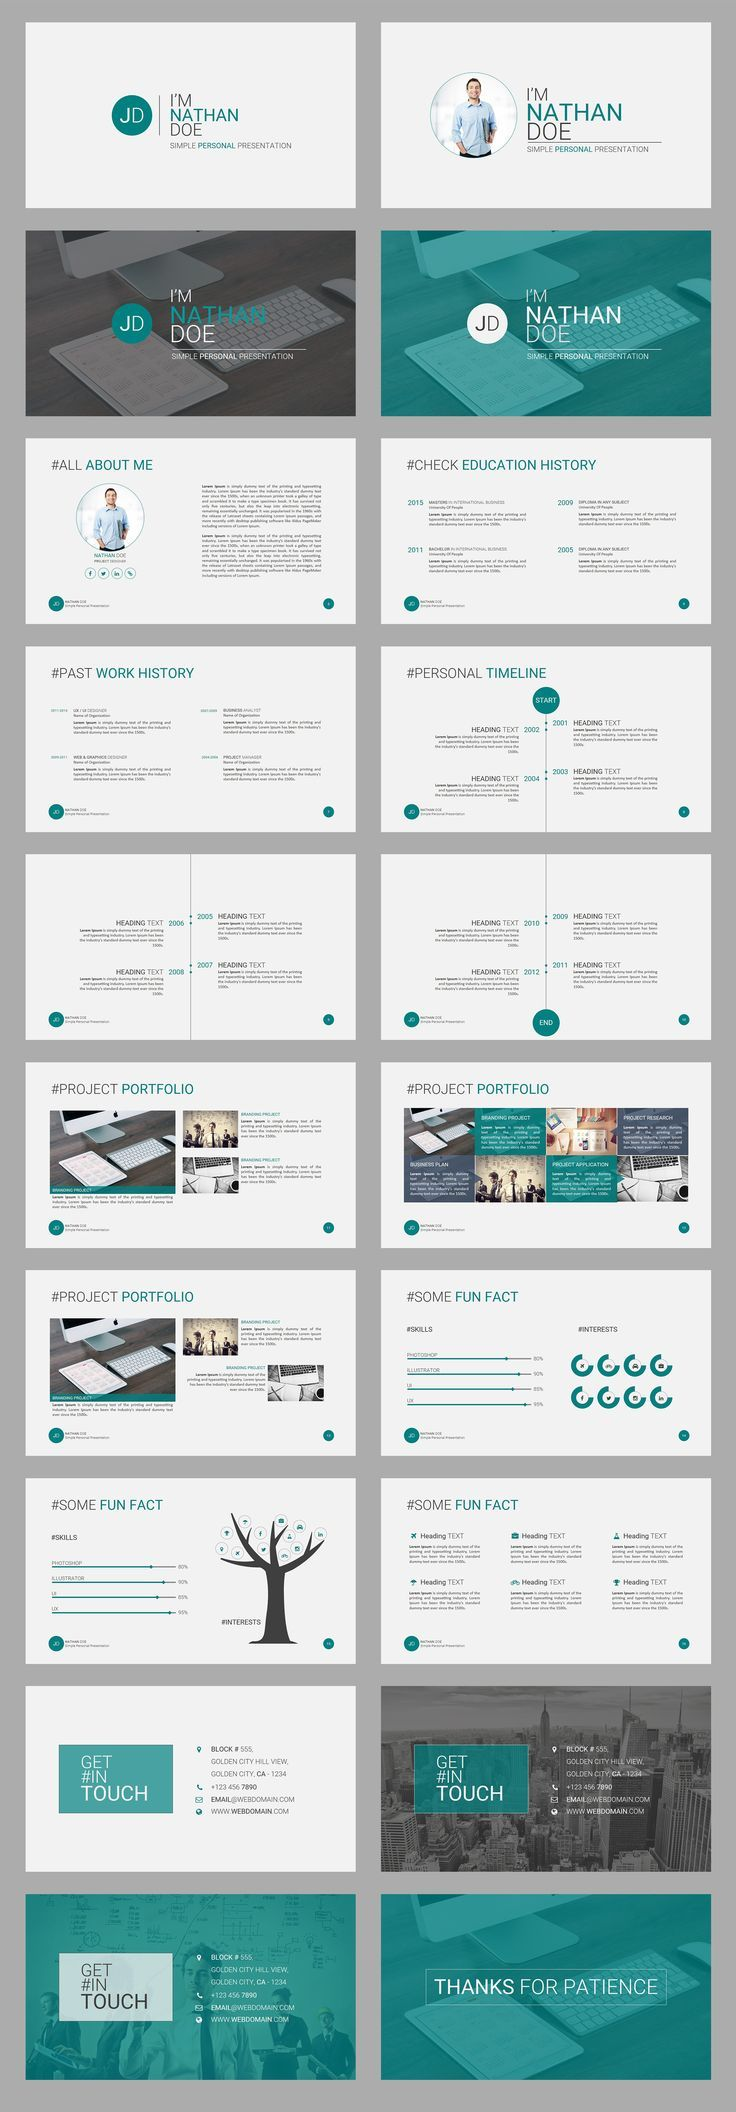 Jd Personal Cv Resume Powerpoint Presentation Template Is A Simple But Am Powerpoint Presentation Design Presentation Template Free Ppt Template Design